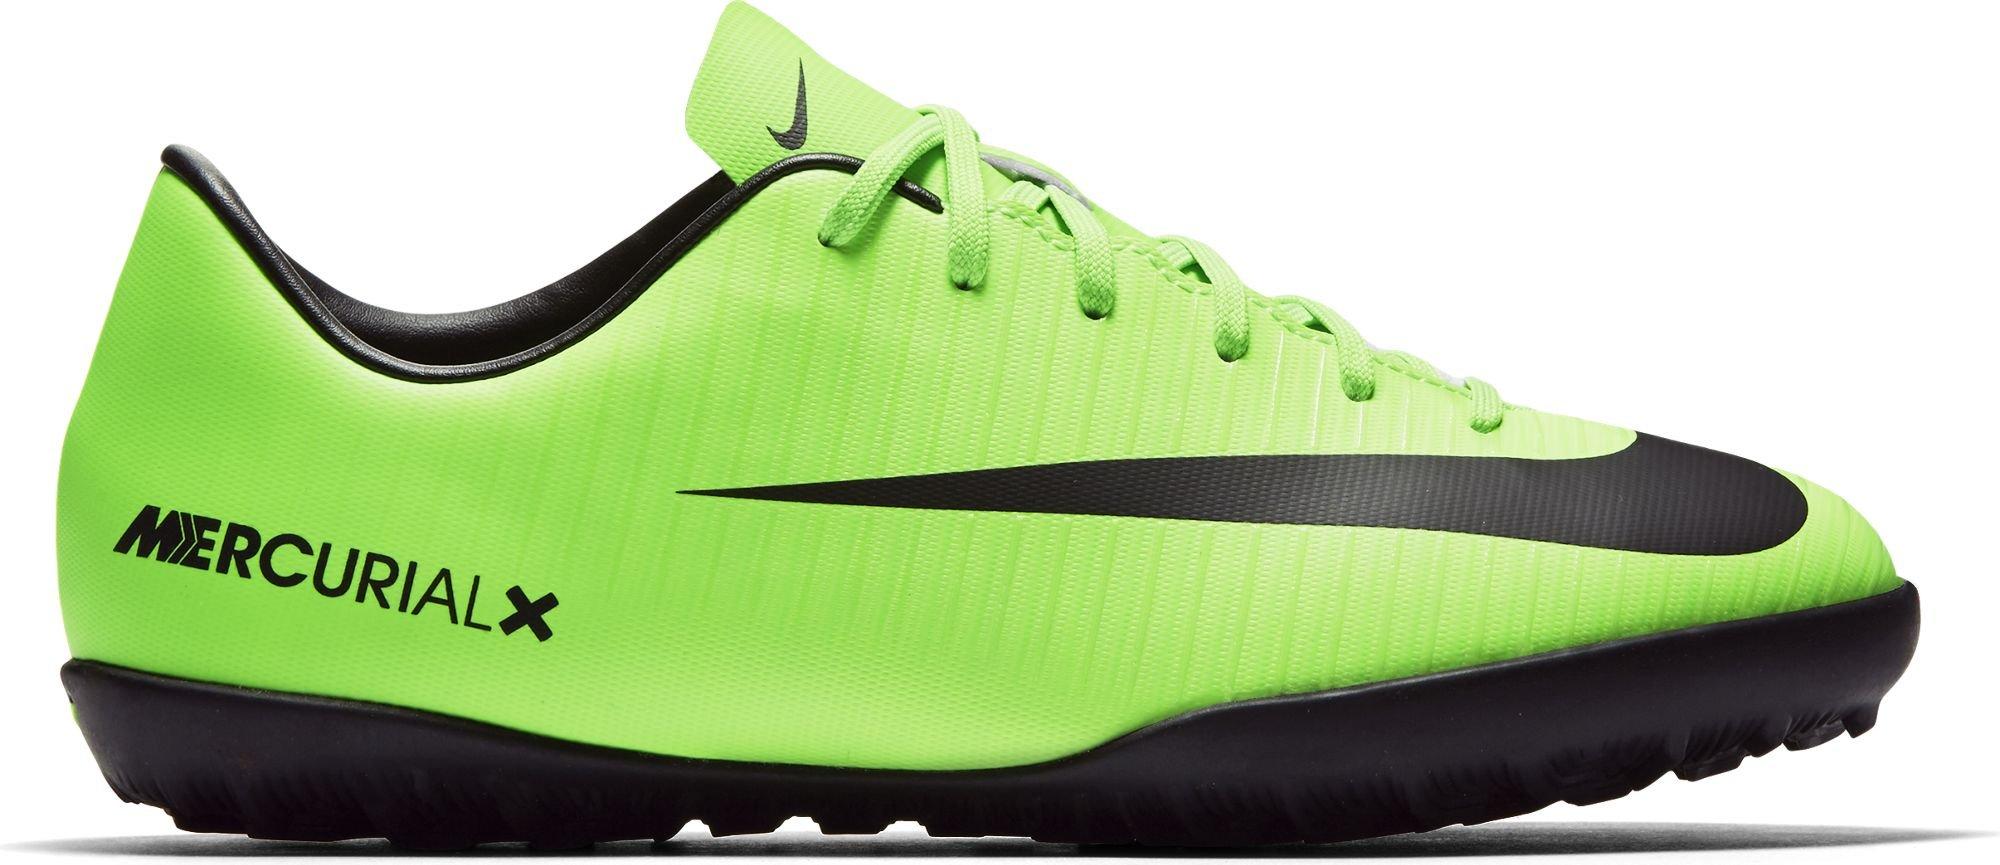 Nike Youth Soccer MercurialX Vapor XI Turf Shoes (2 Little Kid M, Electric GreenBlac/White) by NIKE